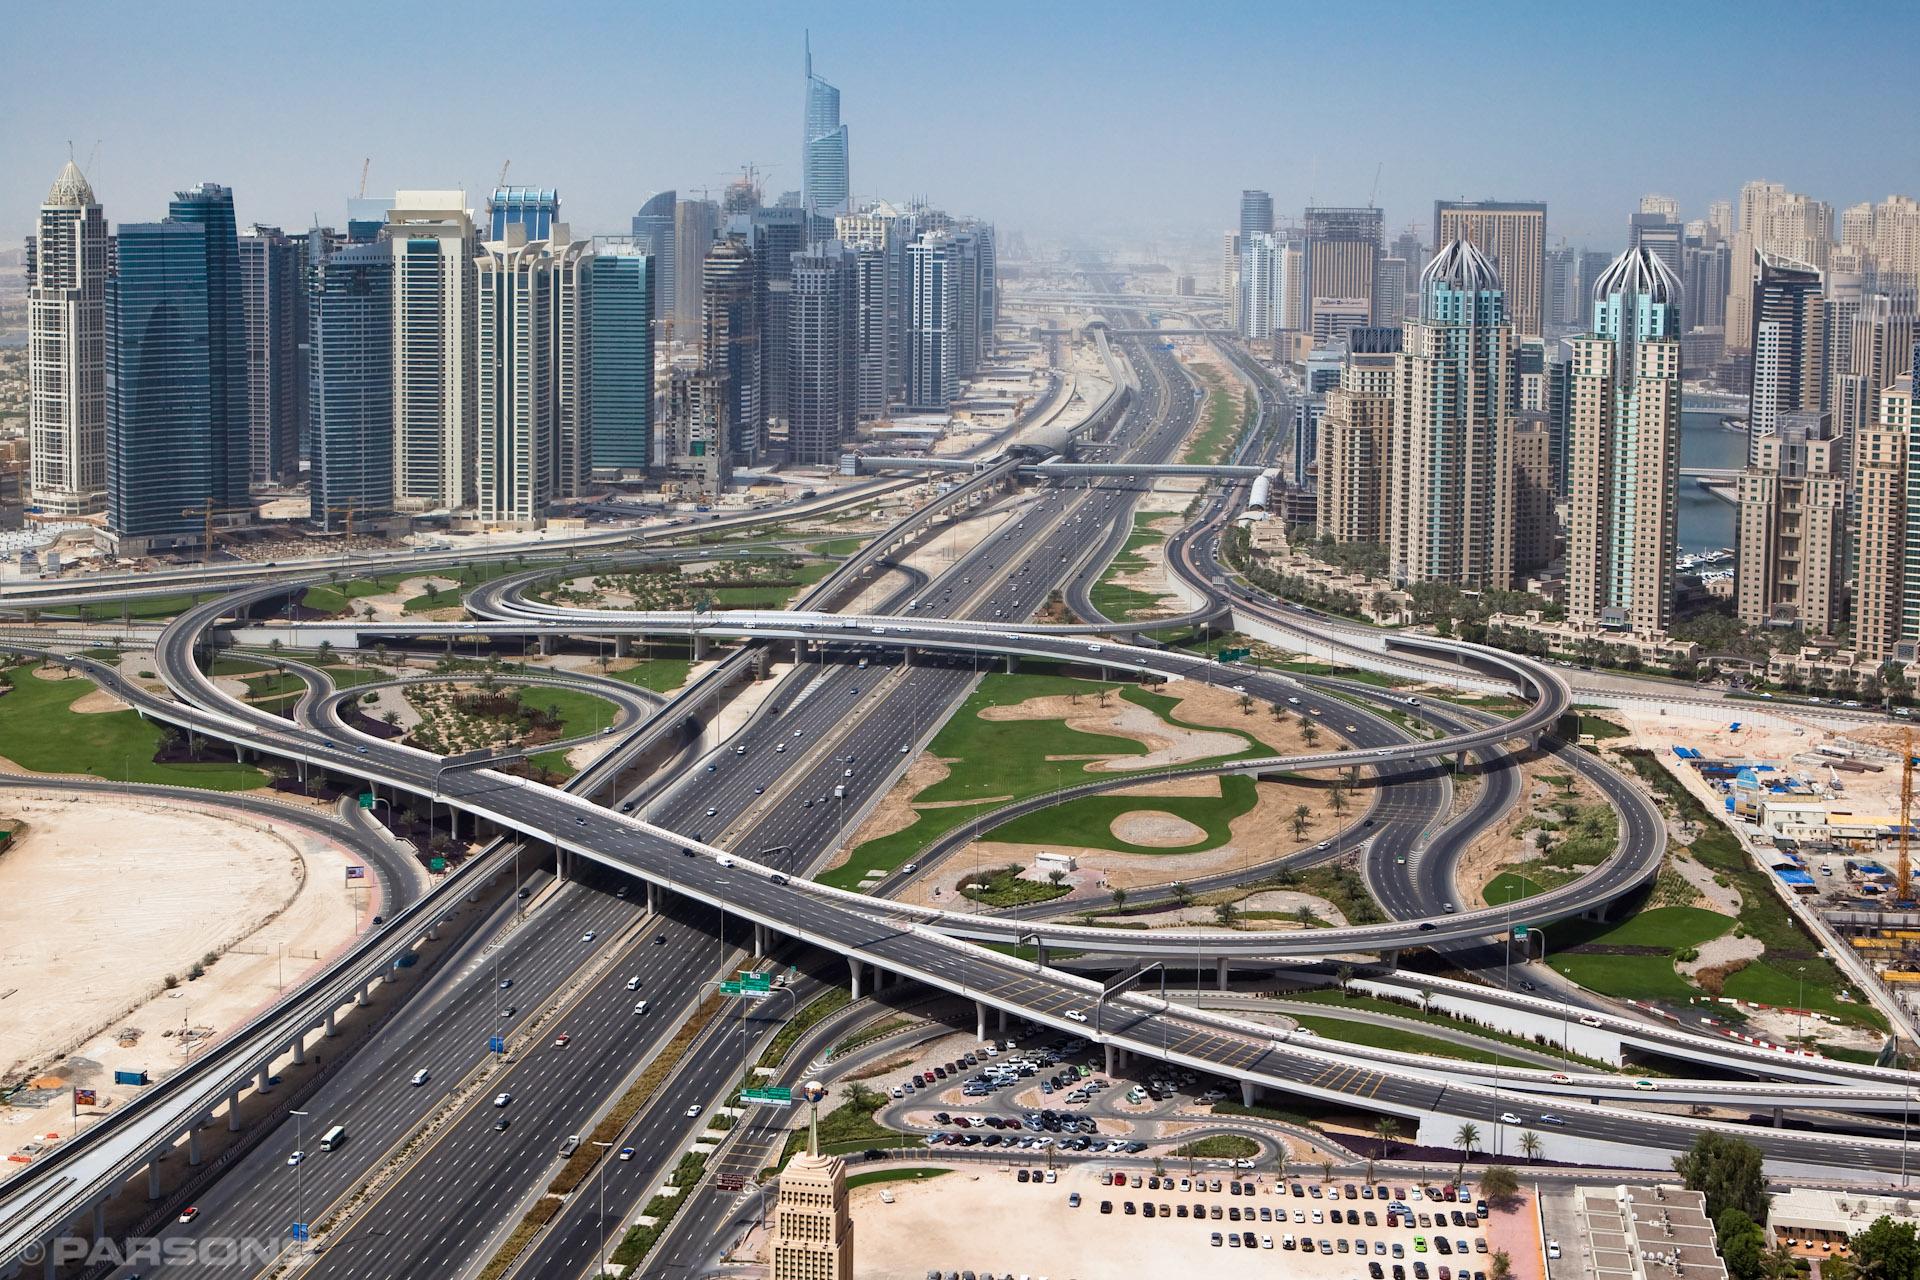 Civil-Engineering-Aerial-Dubai-Skyline-Sheihk-Zayed-UAE-Jason-Bax.JPG